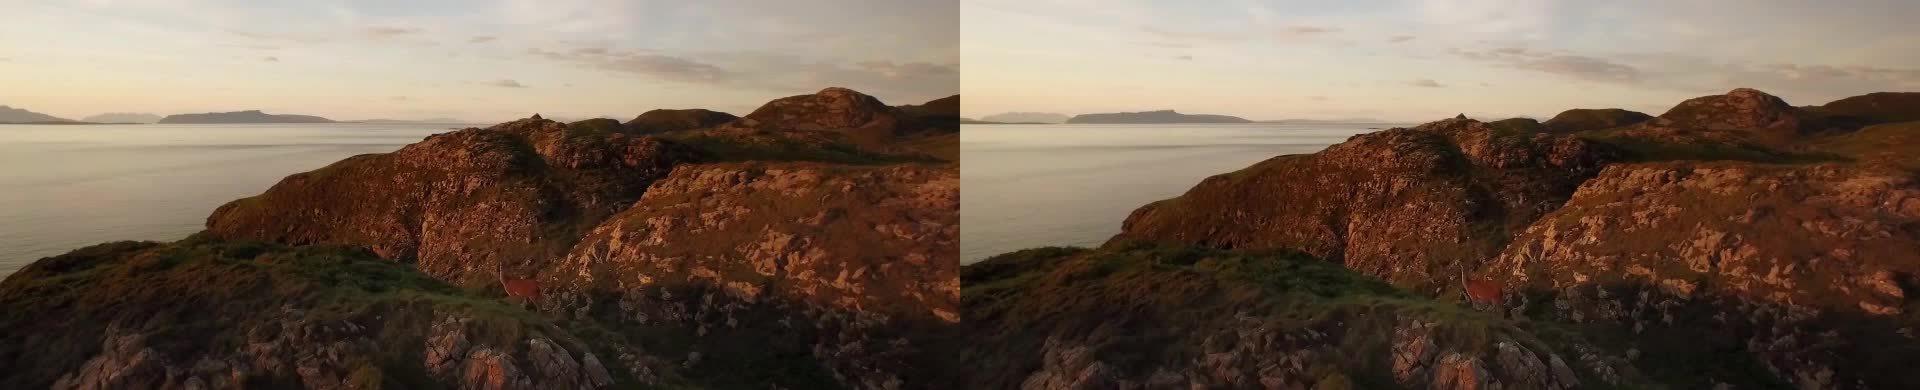 crossview, drone, Wild Scotland (Crossview Conversion) 5 GIFs